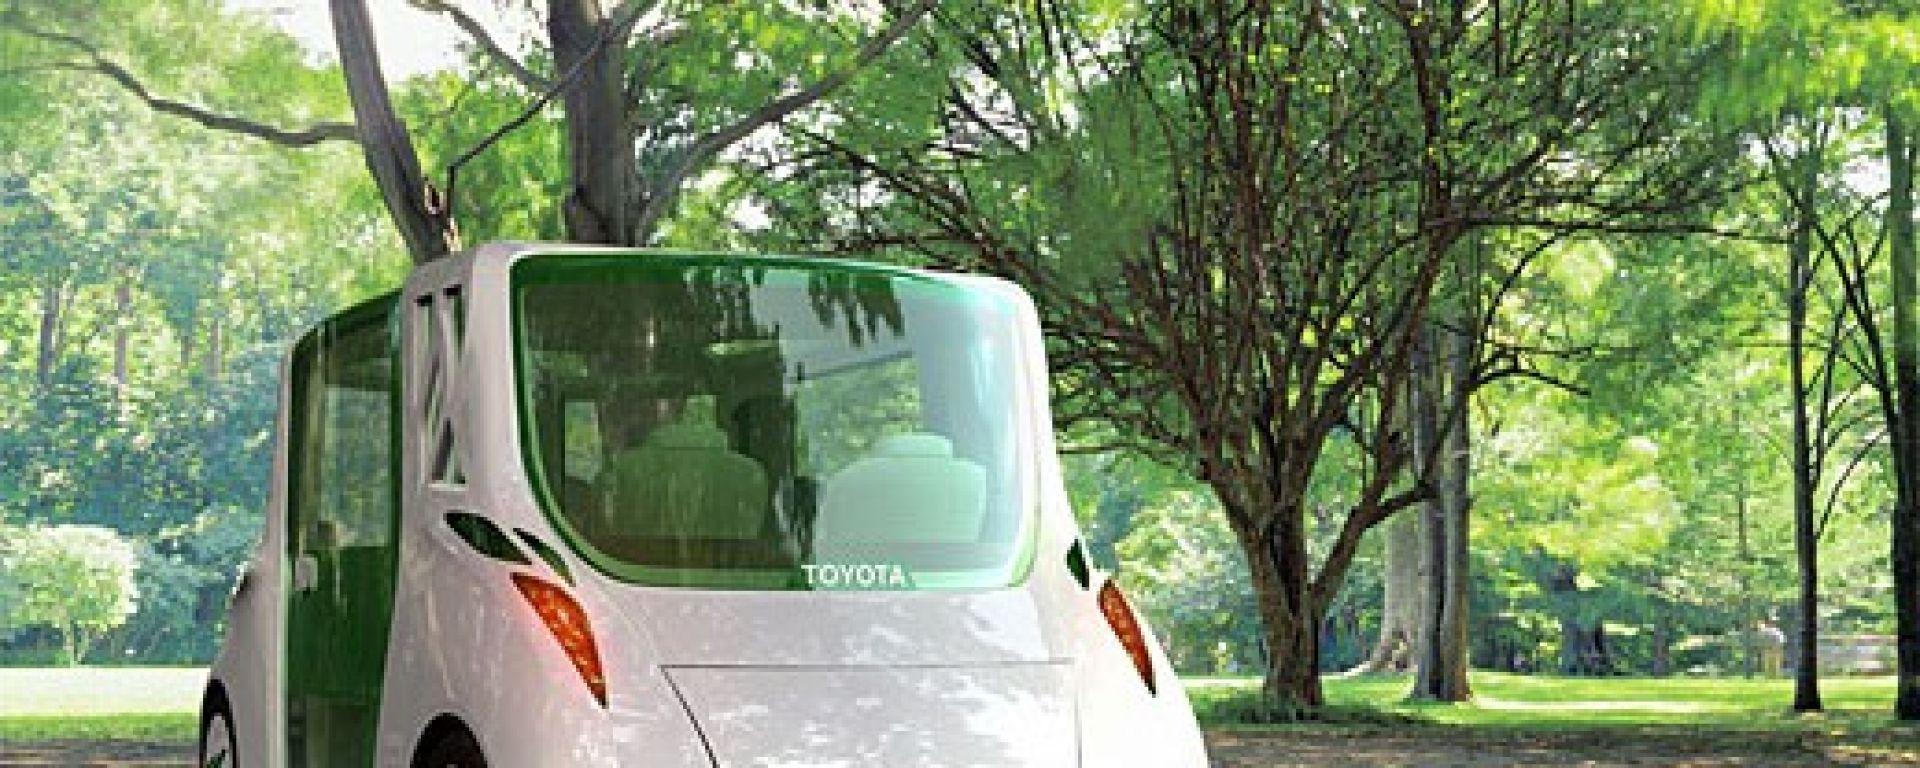 Toyota Rin